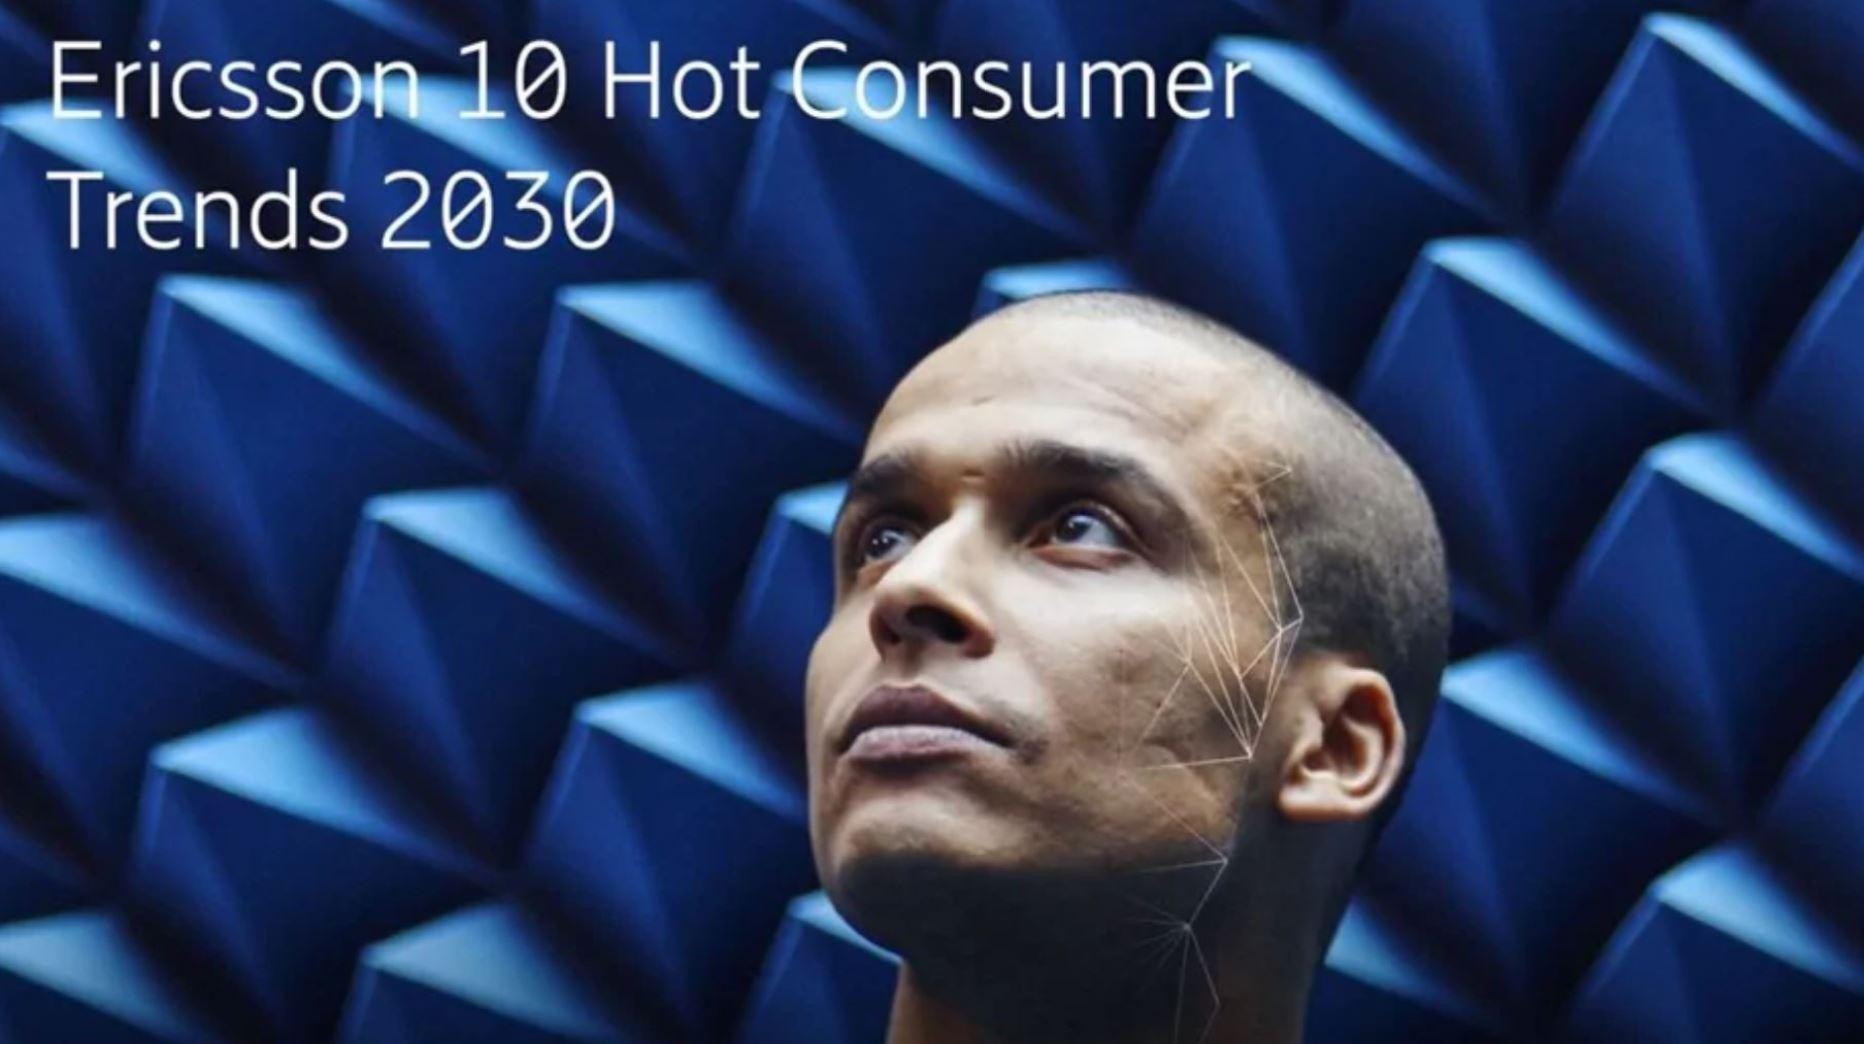 Hot Consumer Trends